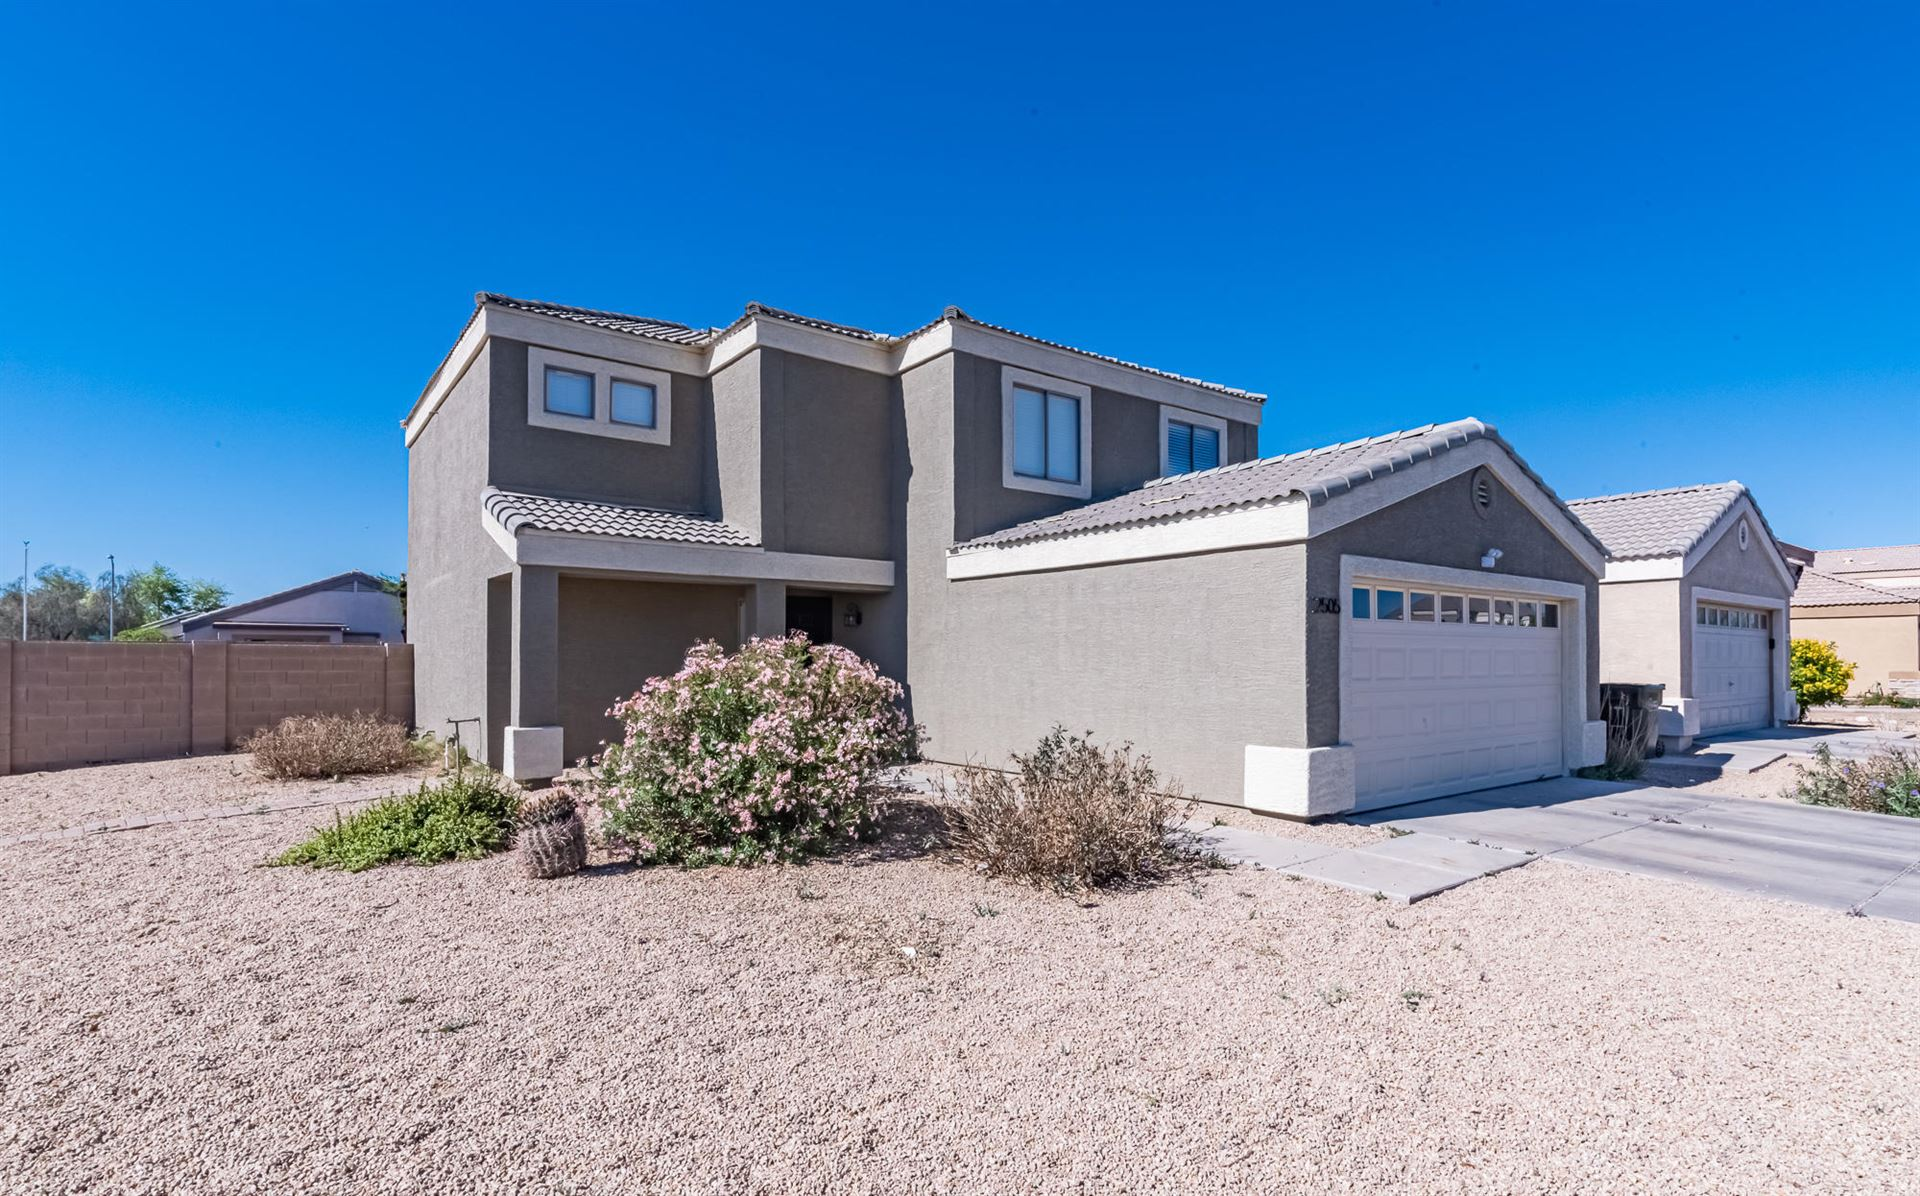 Photo of 12505 W WILLOW Avenue, El Mirage, AZ 85335 (MLS # 6230949)